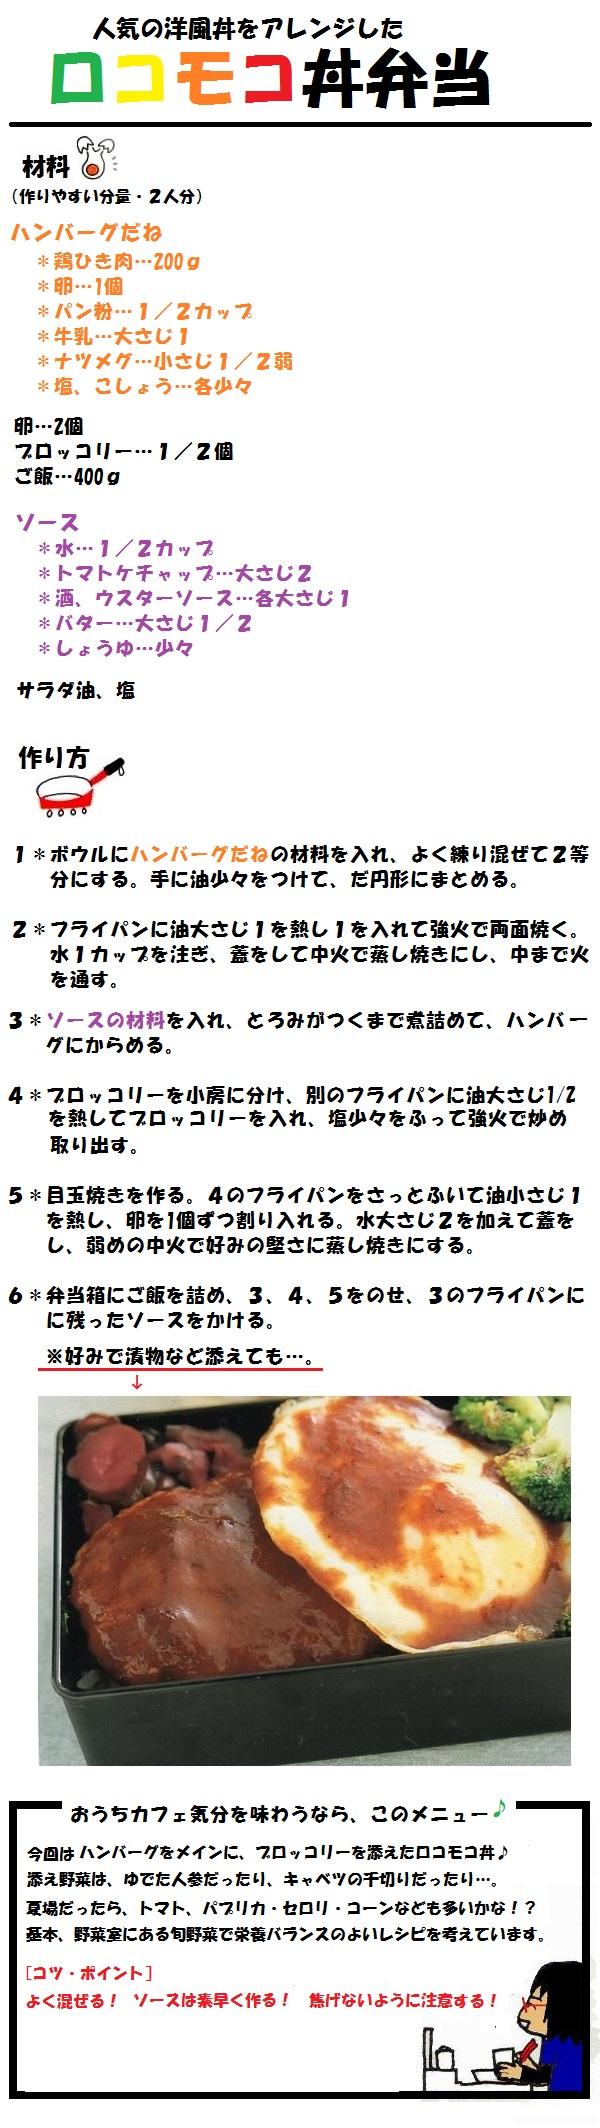 弁当(ロコモコ丼)